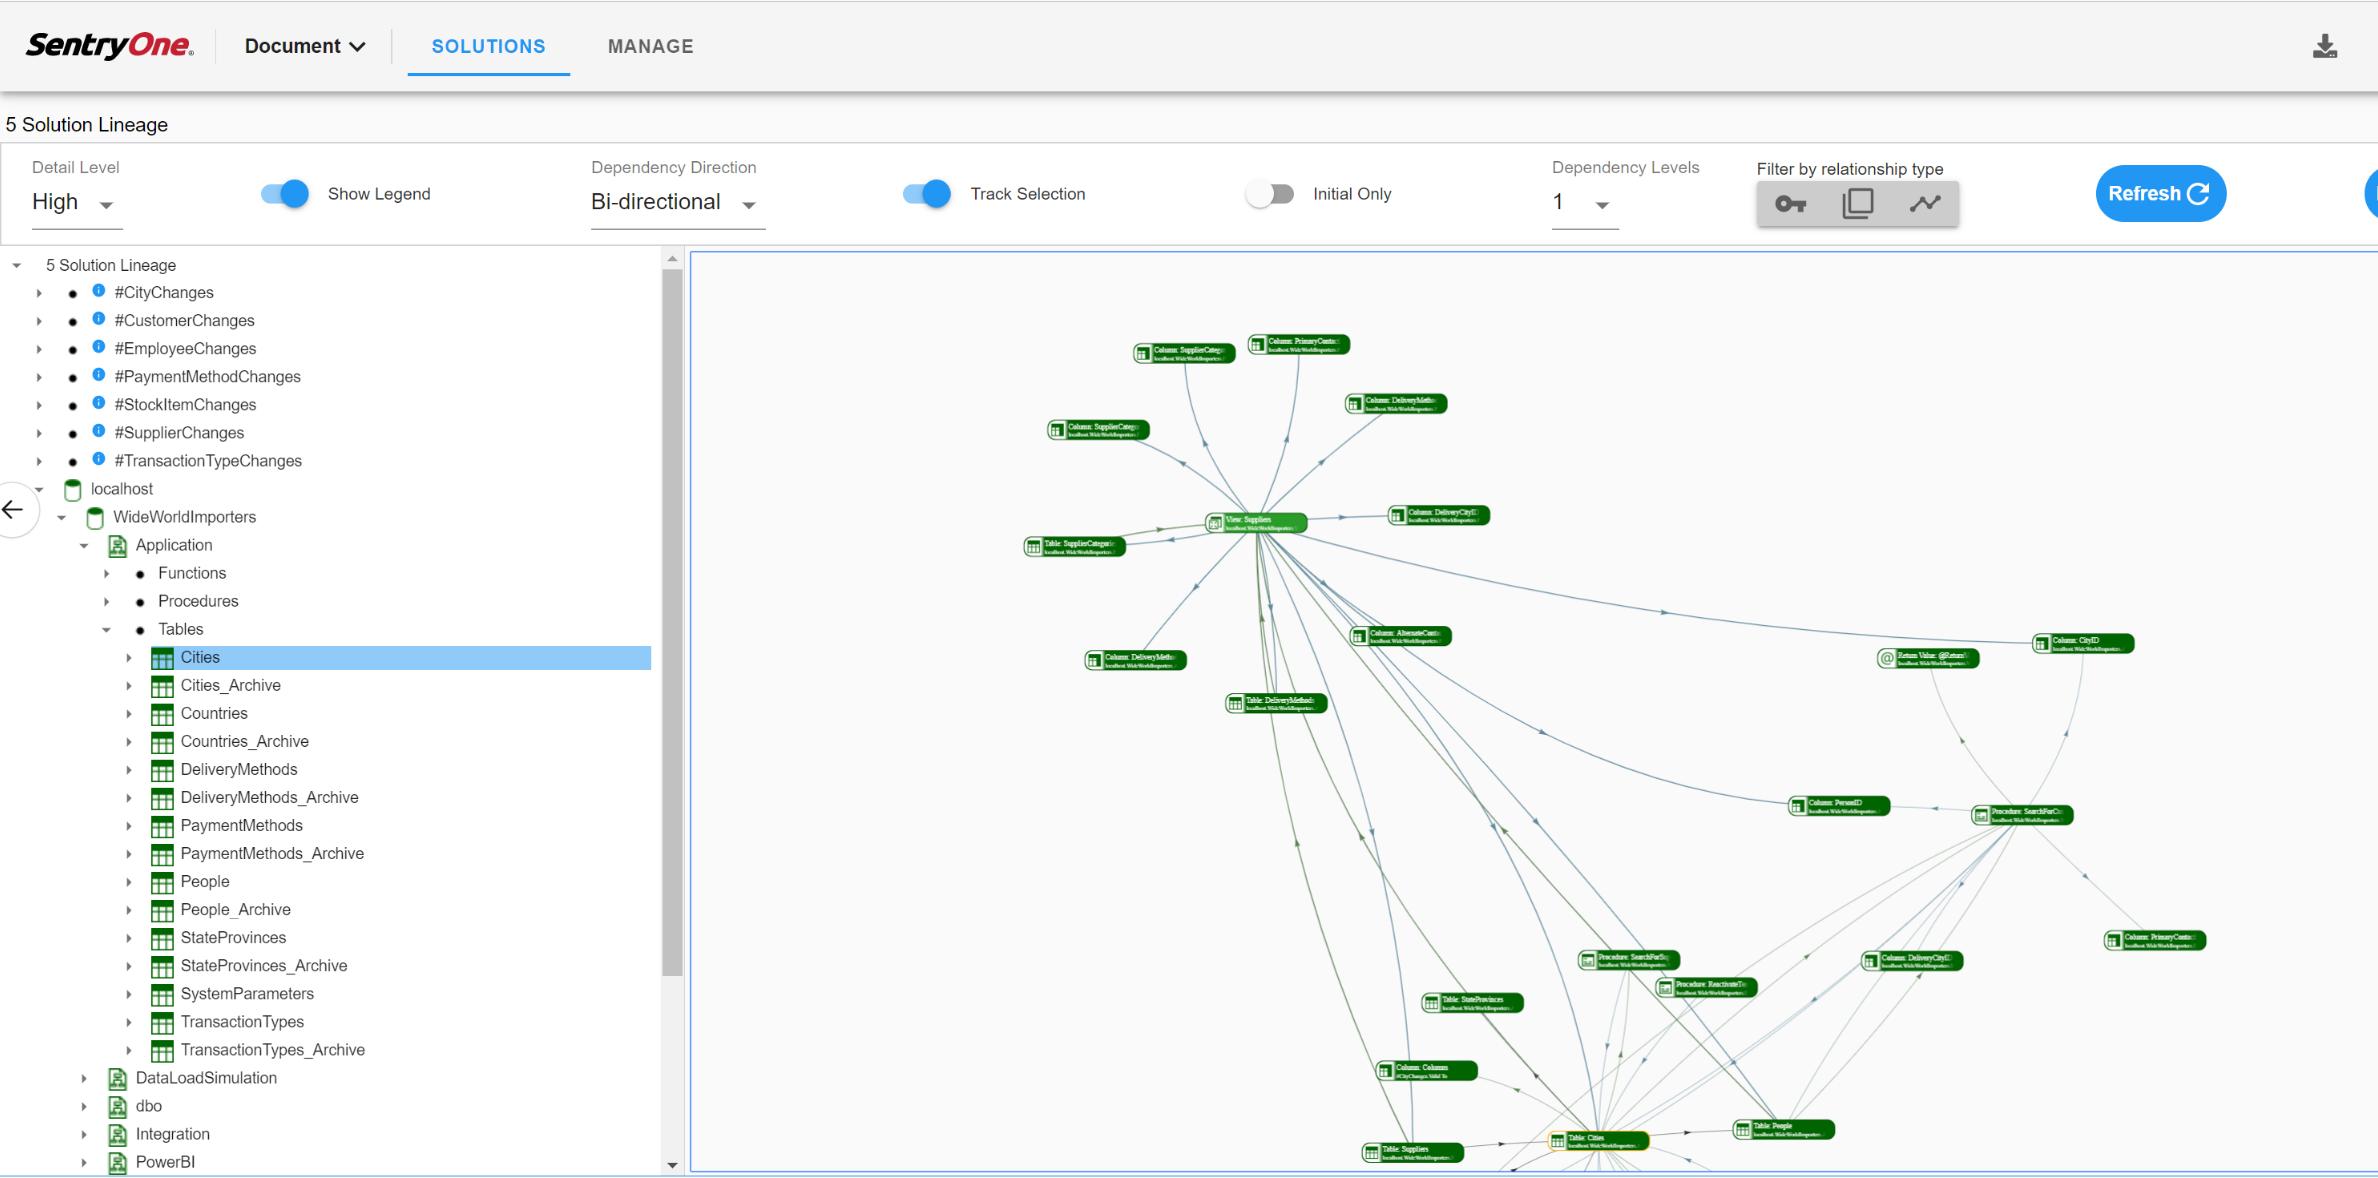 SentryOne_Monitor_Data_Lineage_Analysis